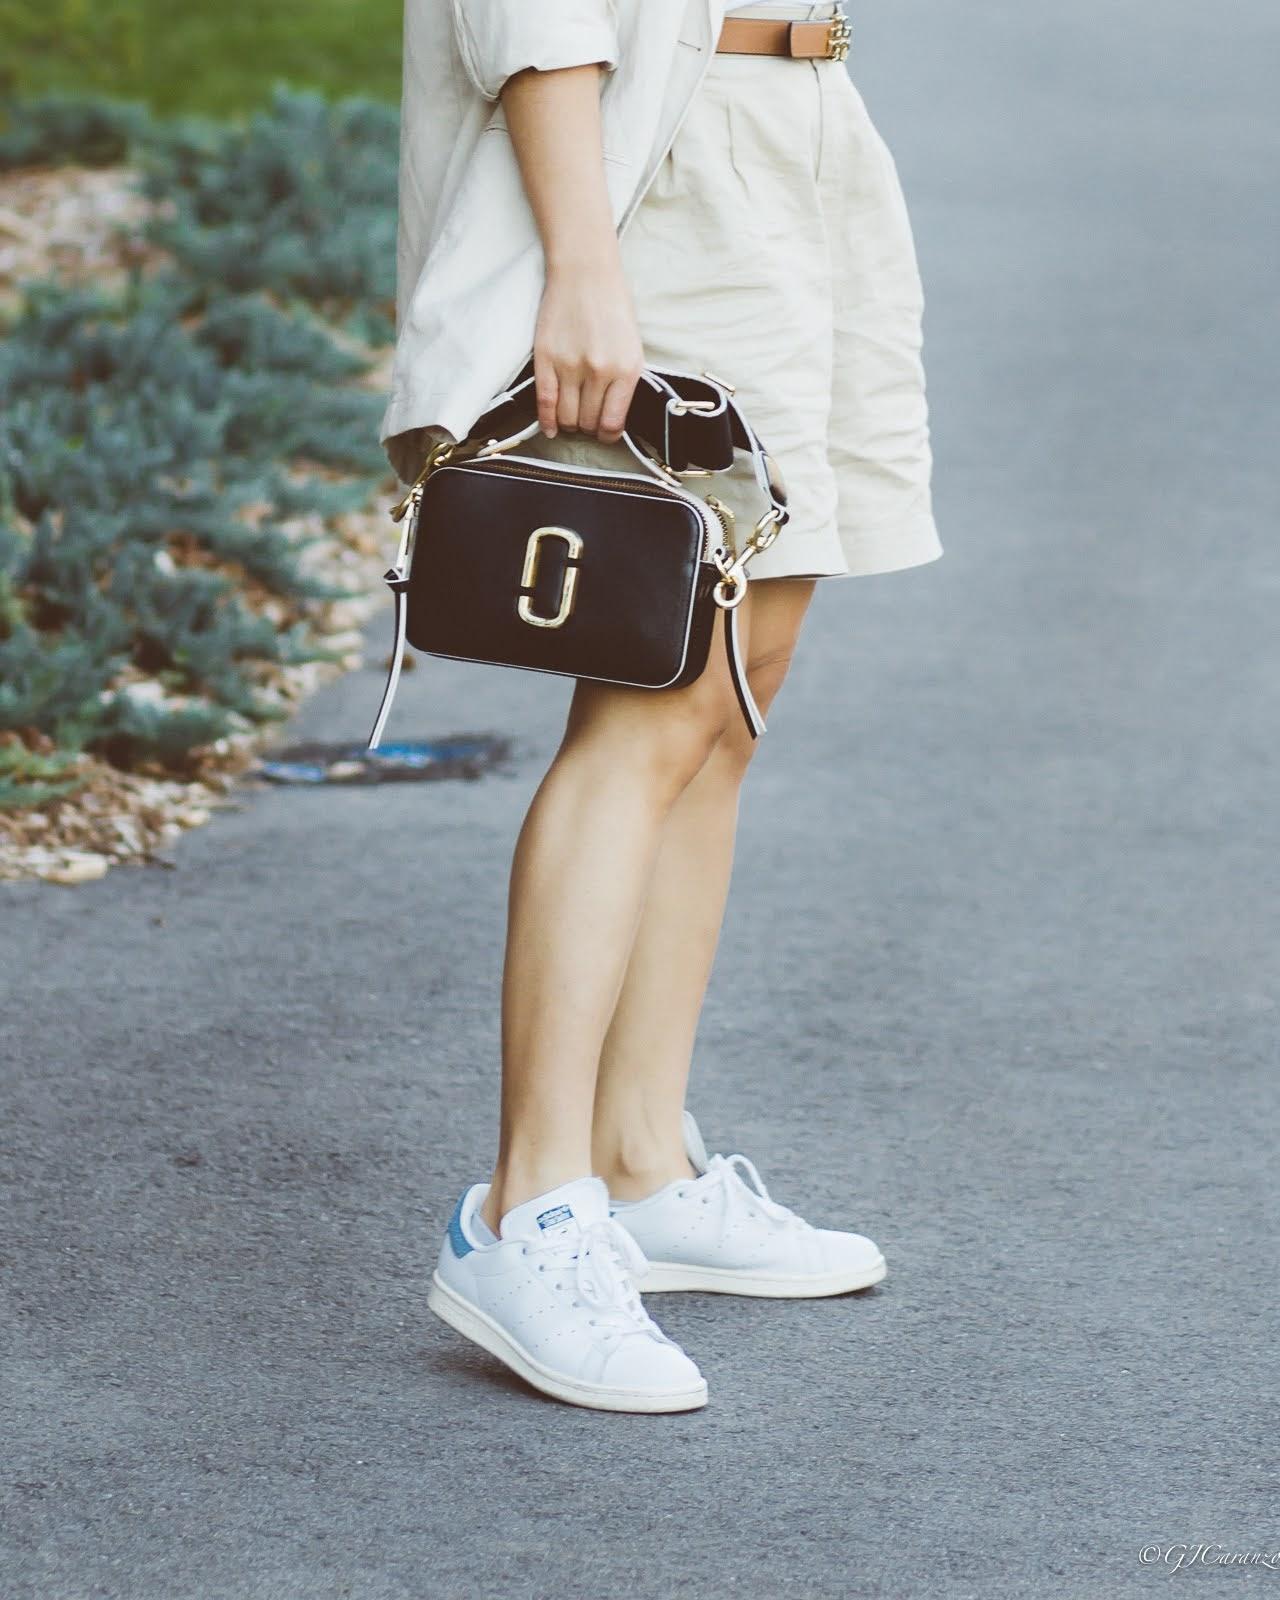 Oversized Linen Blazer   Linen Shorts   Adidas Stan Smith   Marc Jacobs Sure Shot Bag   Tory Burch Reversible Belt   Petite Fashion   Mom Style   Gucci Sunglasses